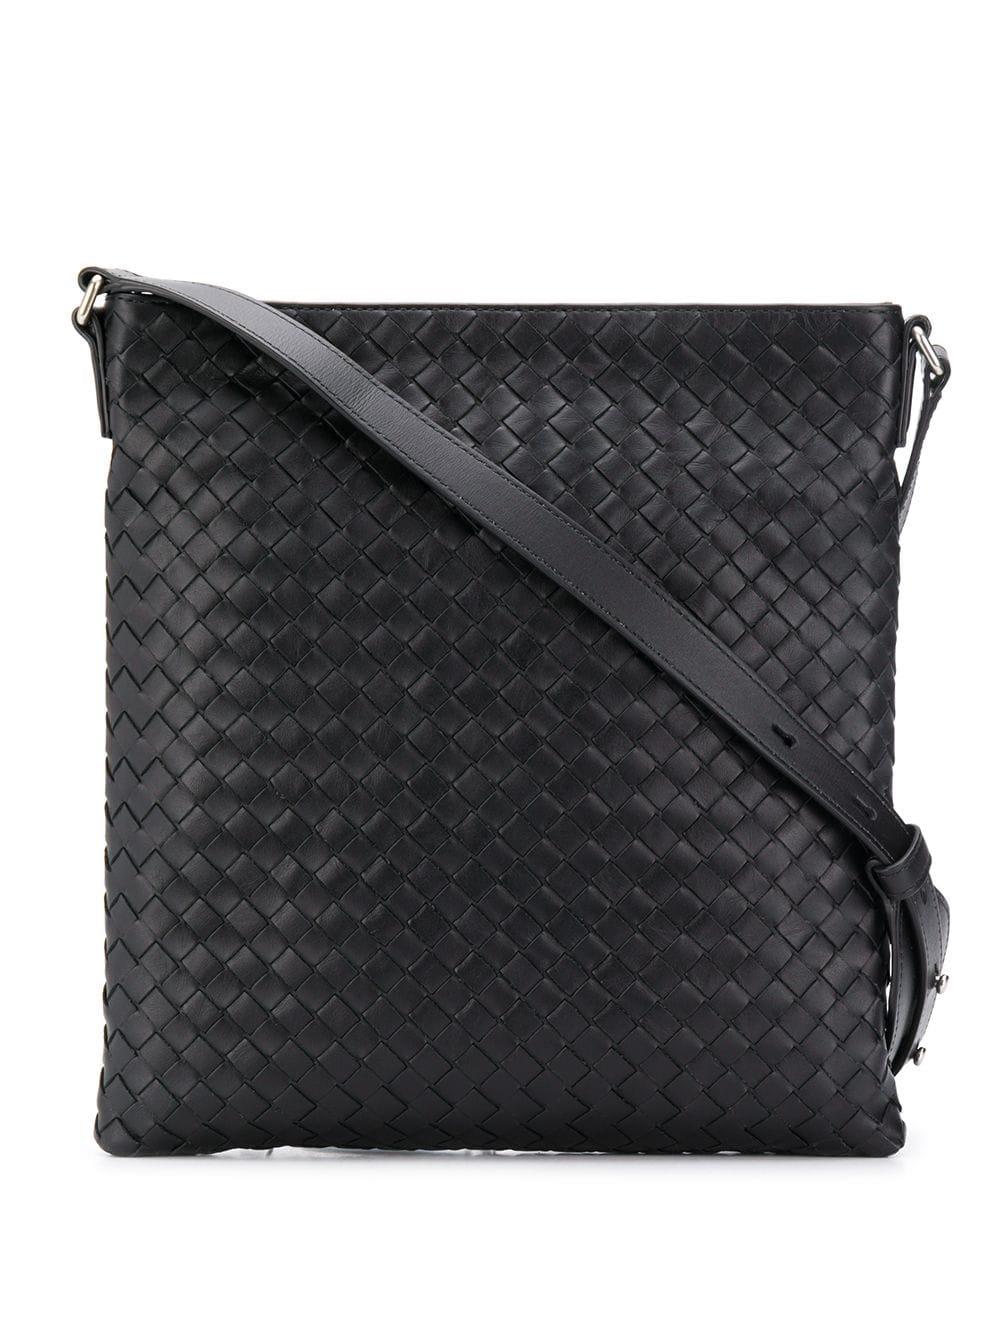 Bottega Veneta   сумка на плечо с плетением Intrecciato   Clouty